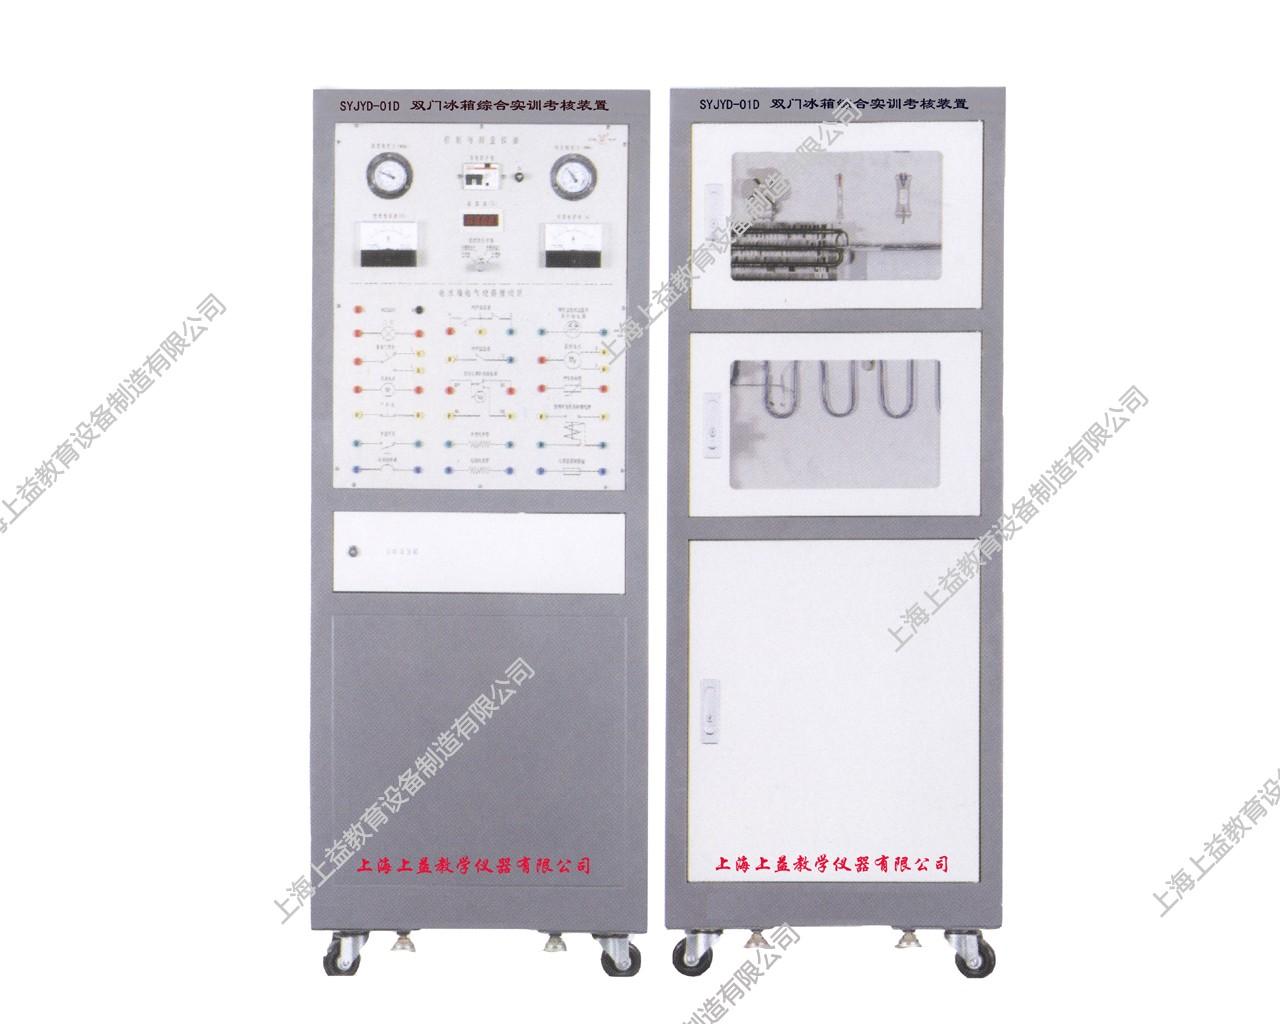 SYZLRX-01D型 双门电冰箱综合wwwlehu8viplehu68vip装置